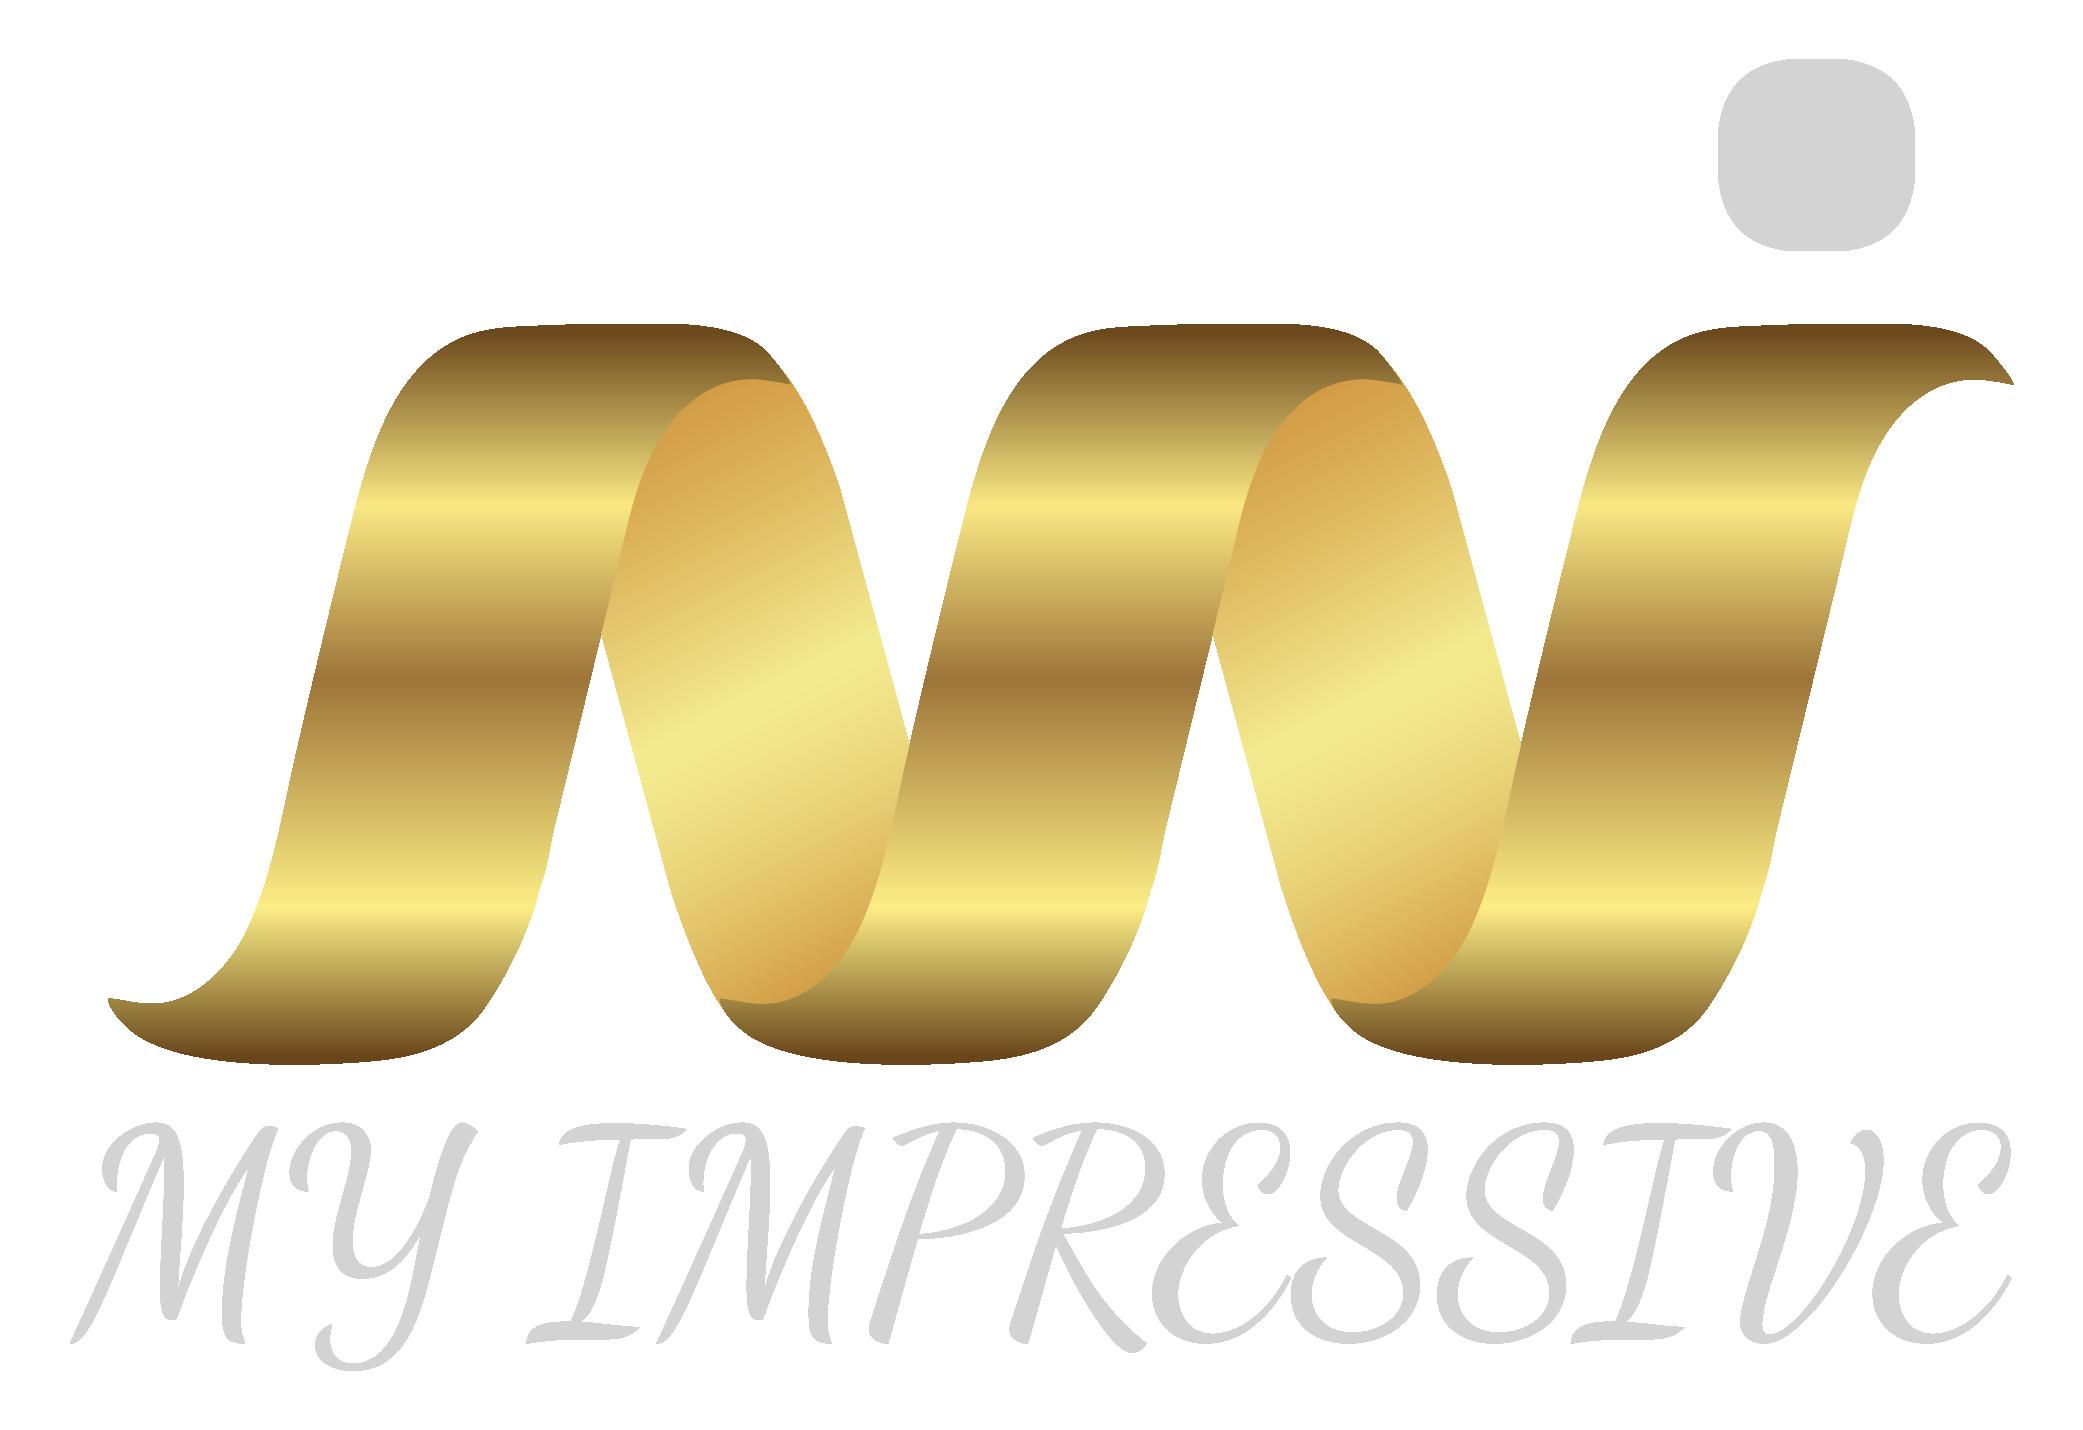 My Impressive,LLC